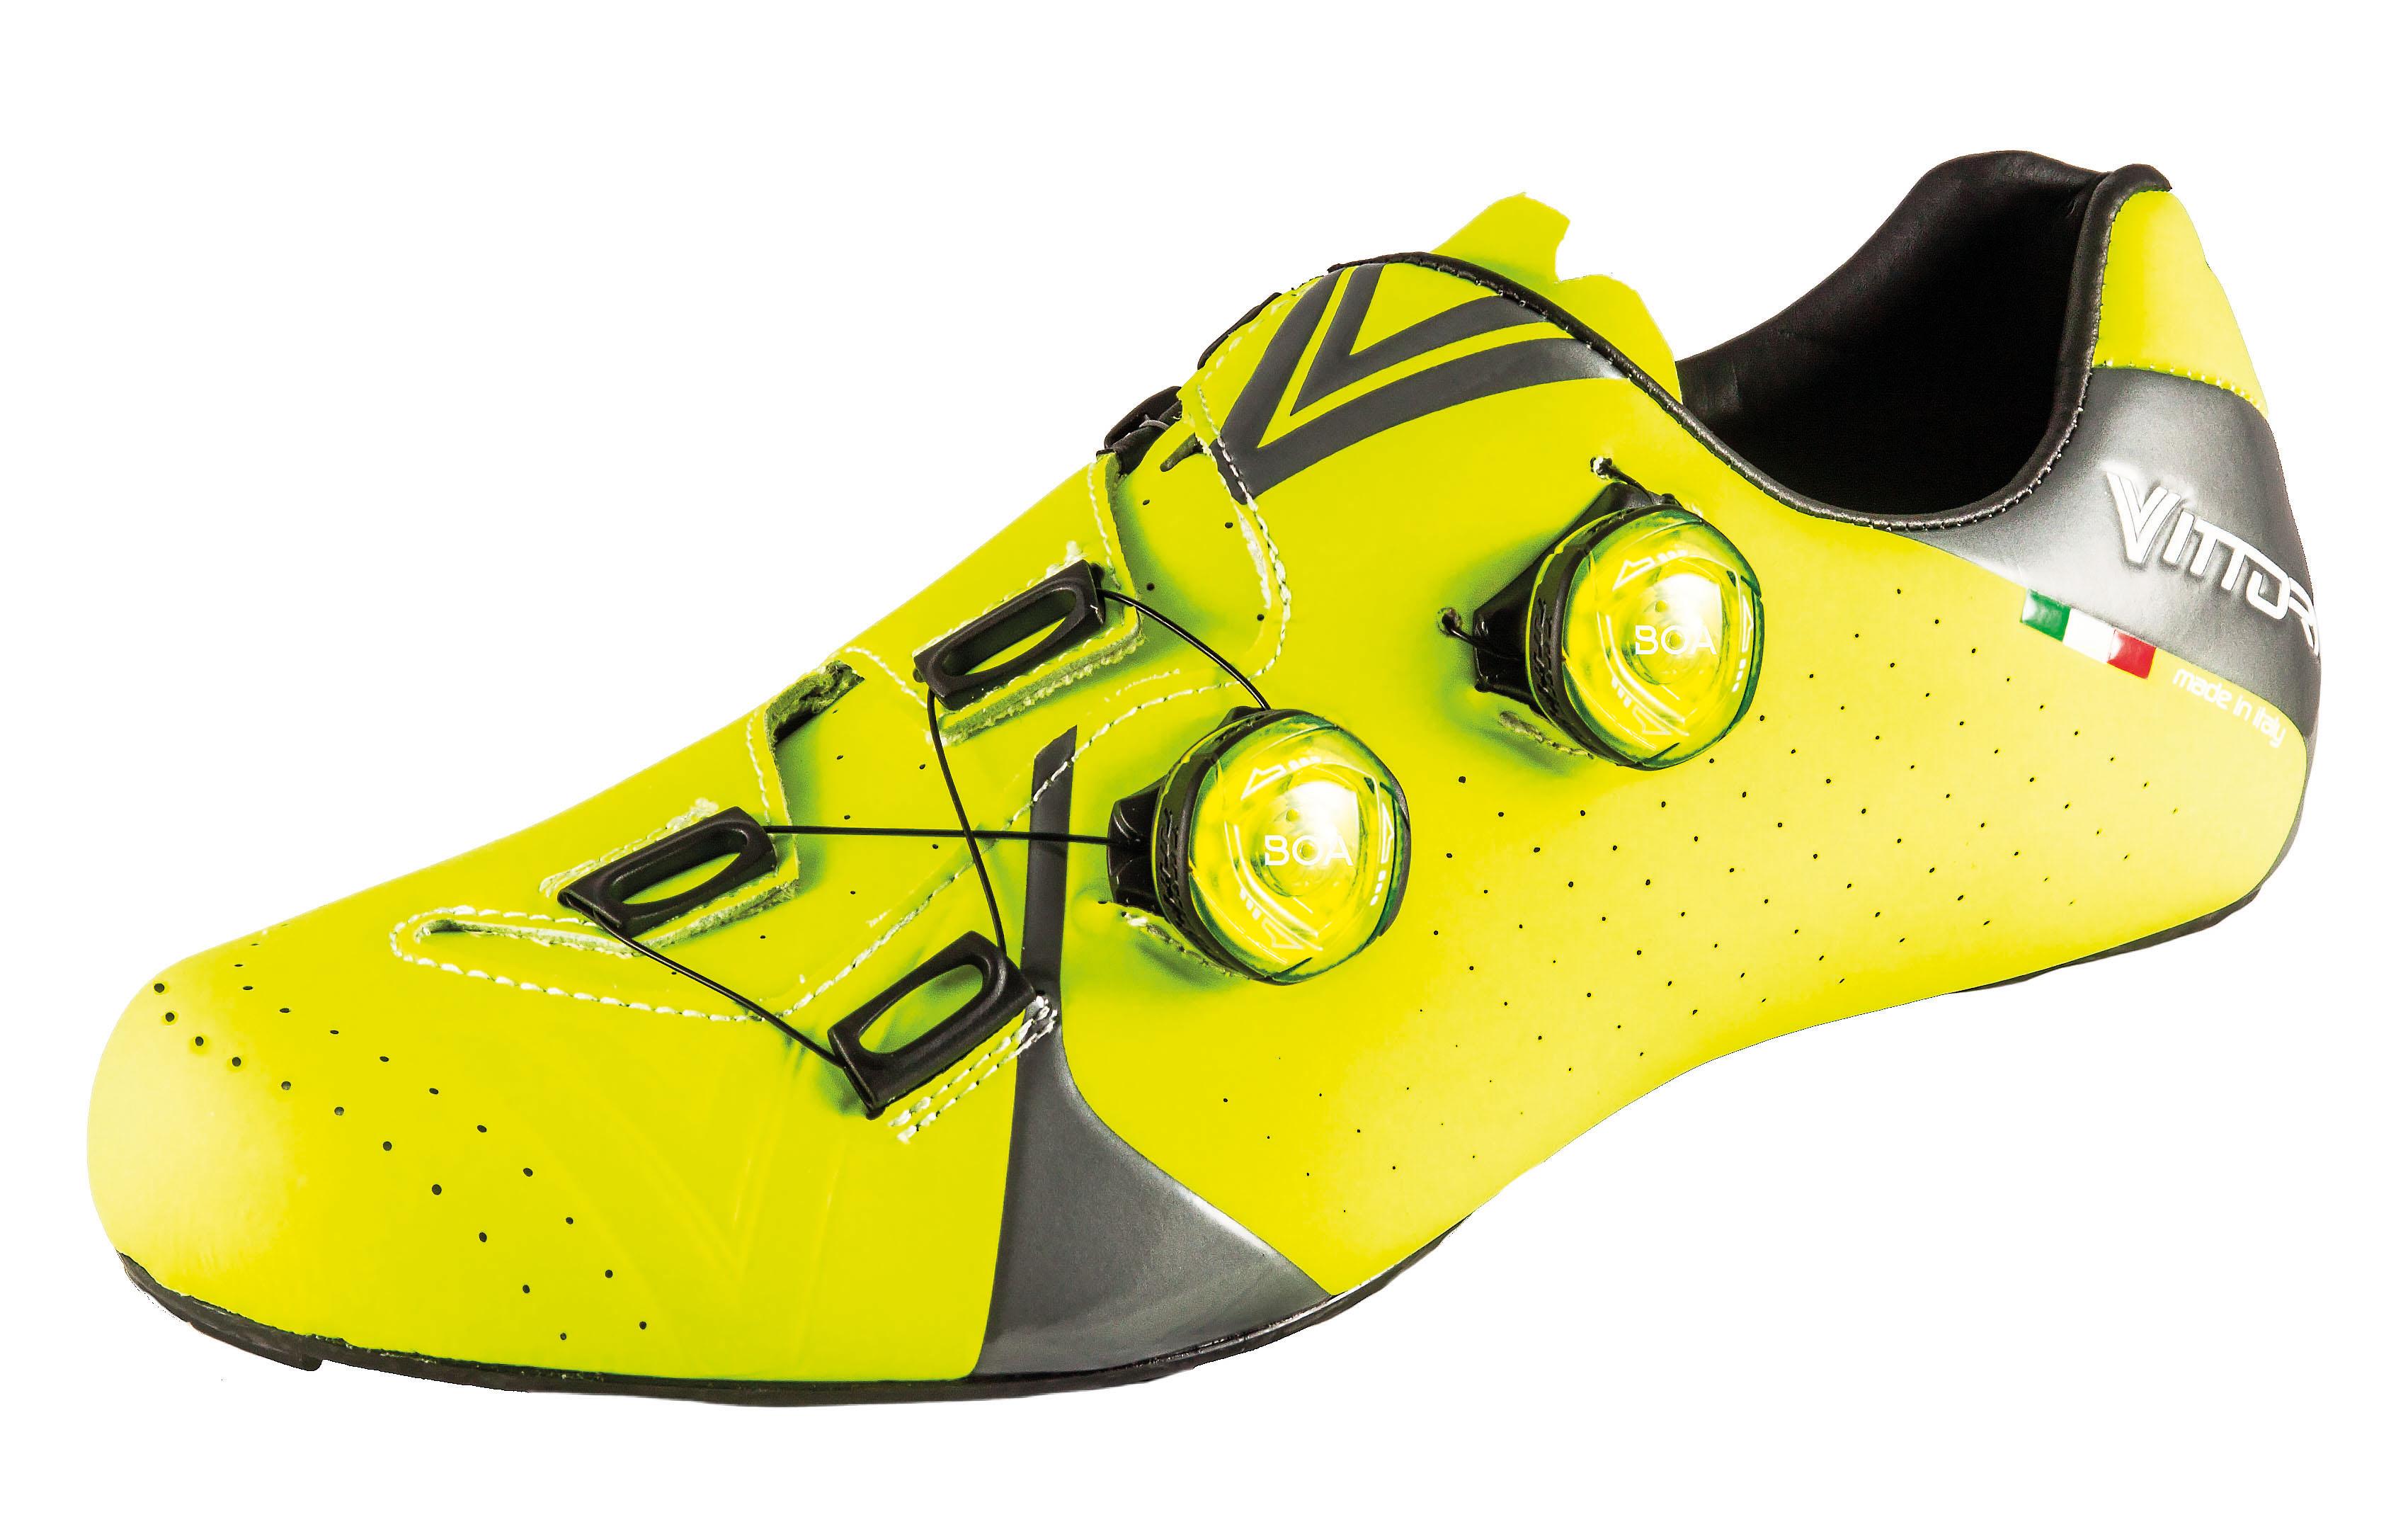 Čevlji vittoria velar   fct carbon neon yellow